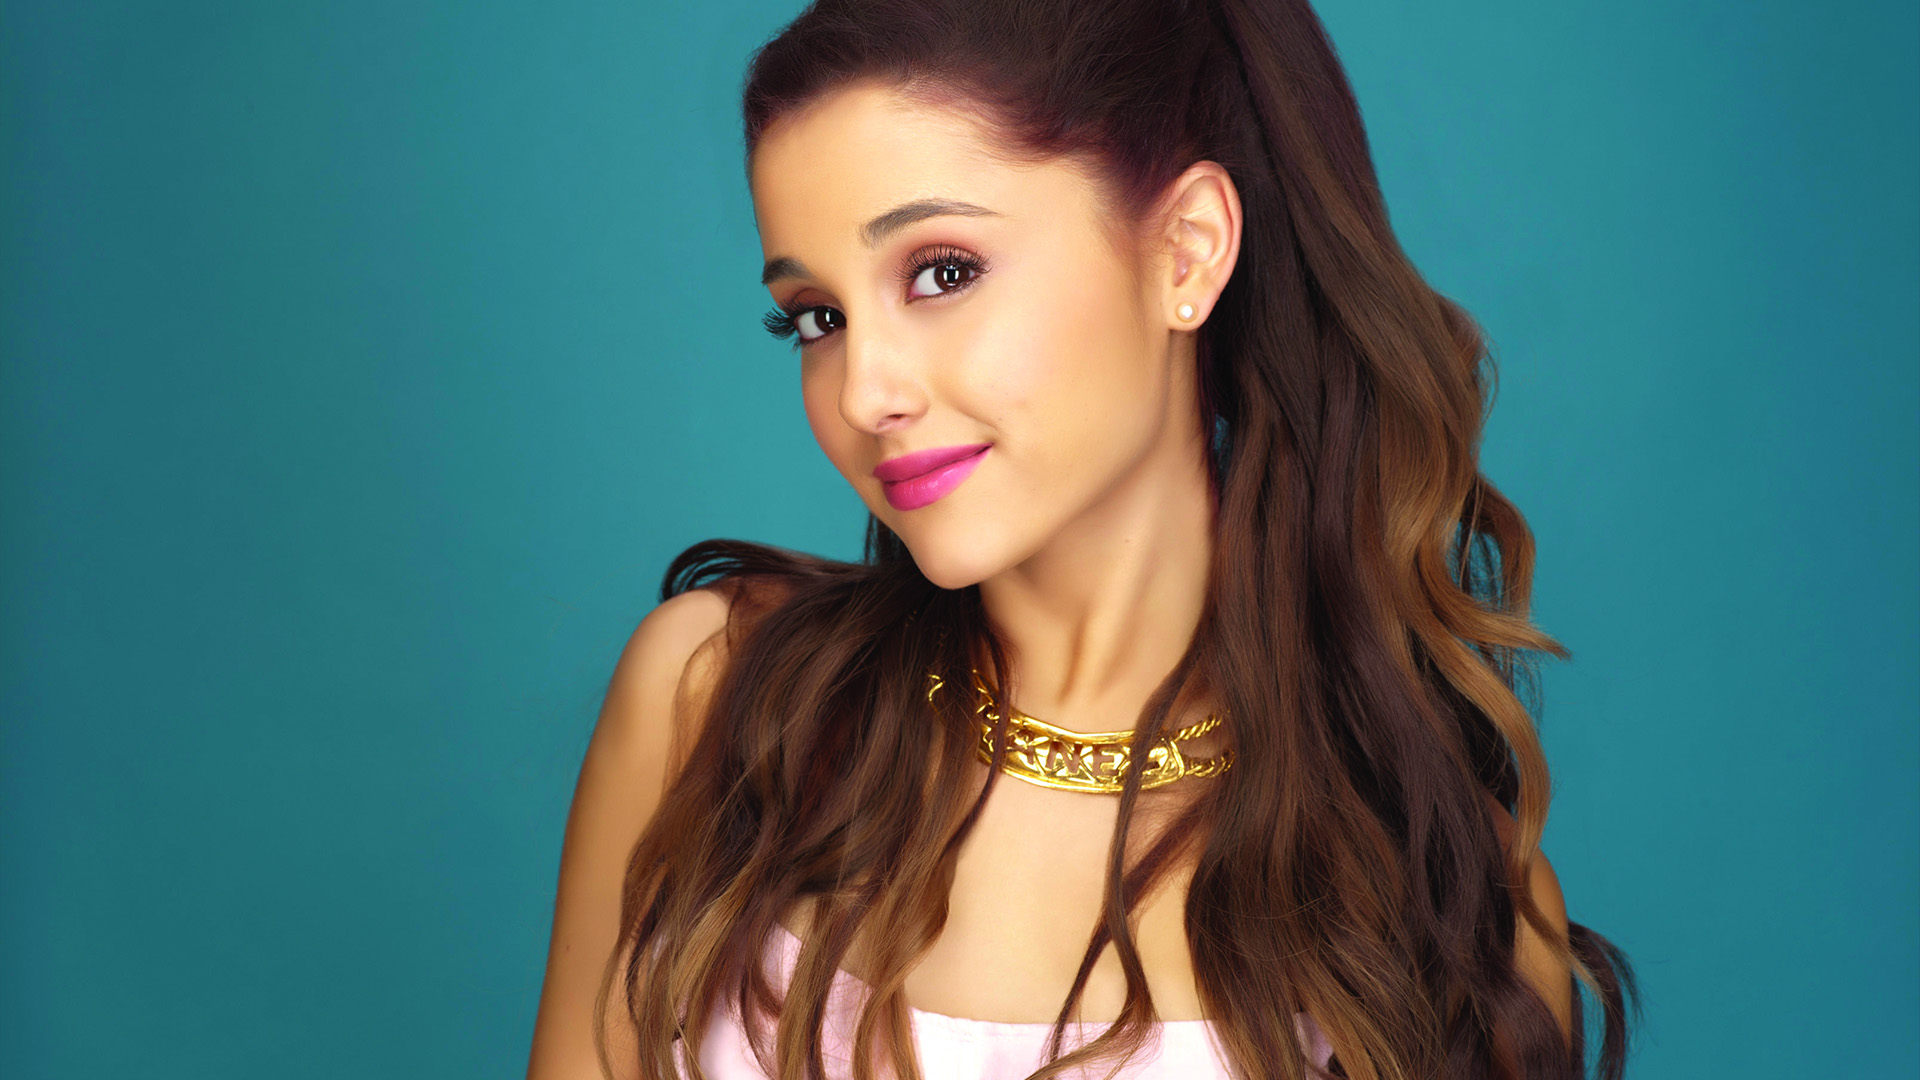 merican pop singer Ariana Grande will perform at the Singapore F1 Grand Prix.